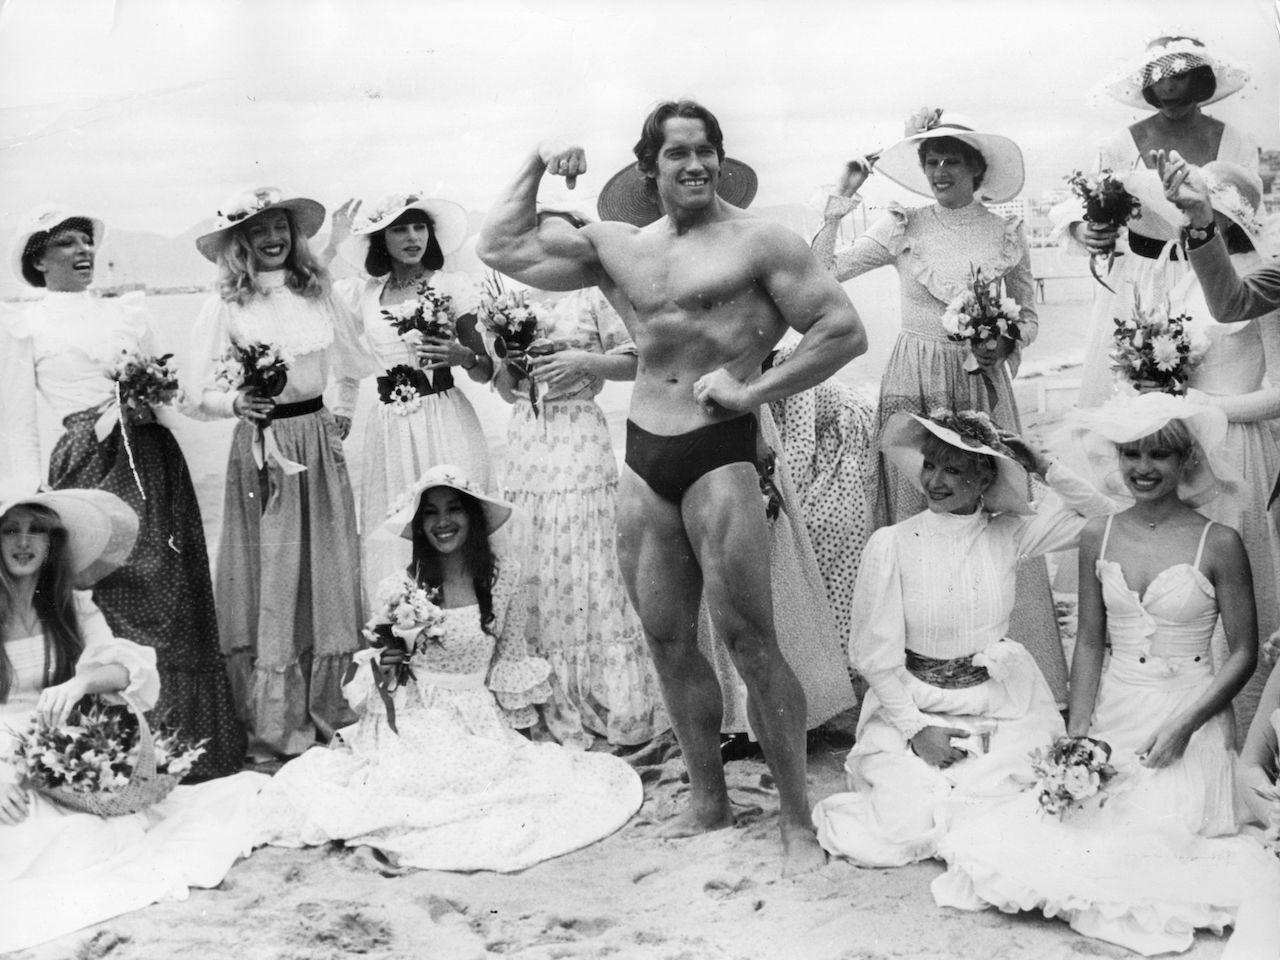 Arnold Schwarzenegger on Cannes beach during the Film Festival